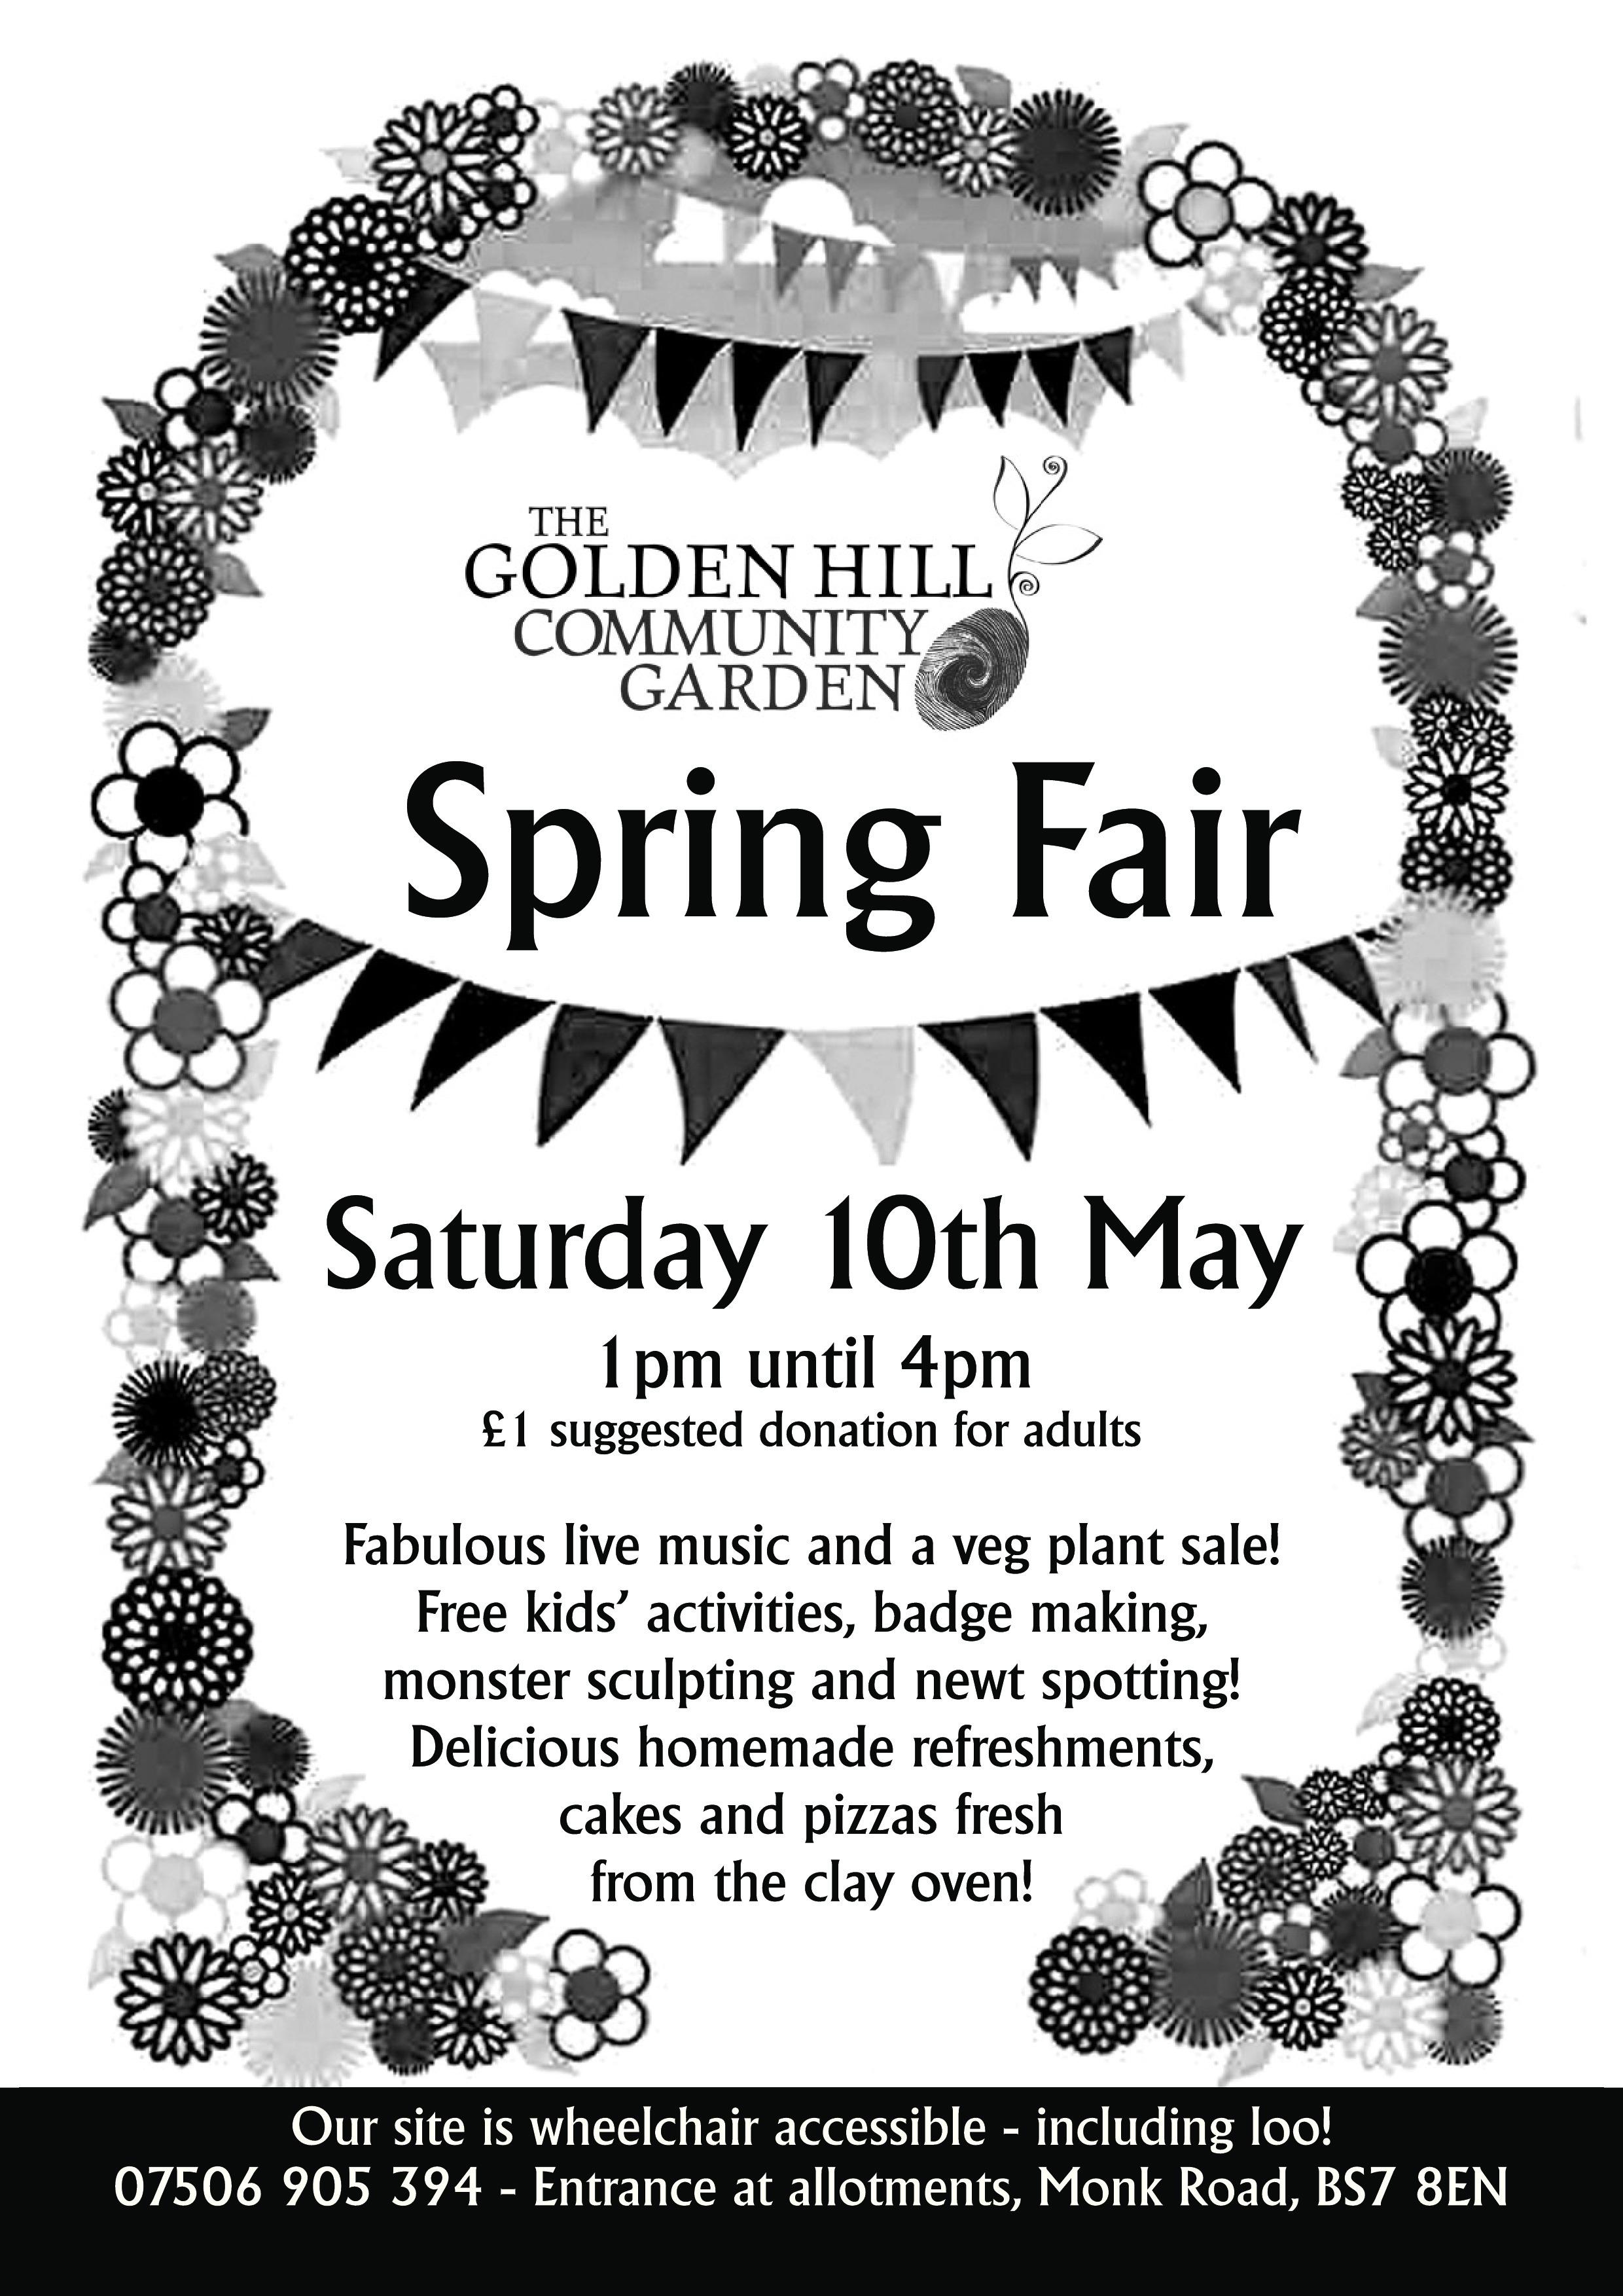 Spring fair flyer 2014